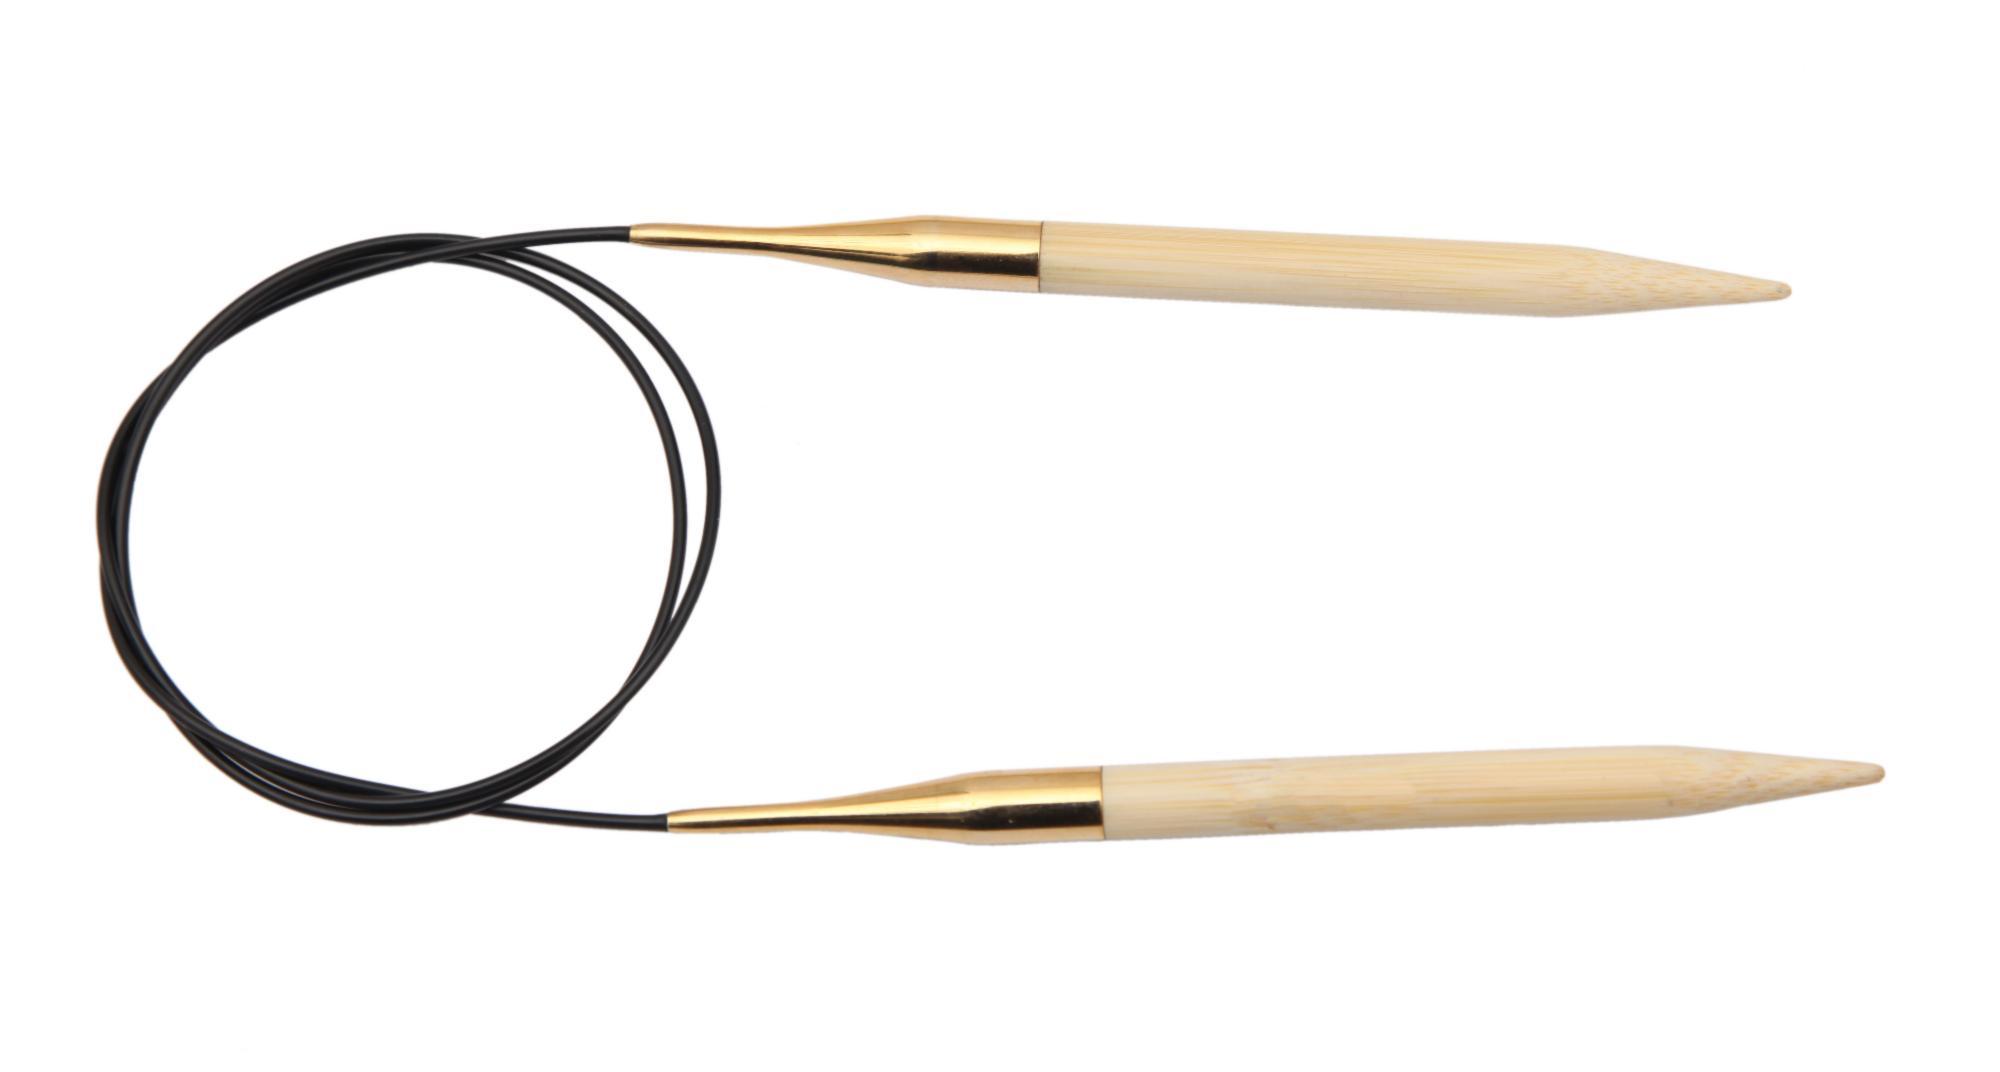 Спицы круговые 100 см Bamboo KnitPro, 22263, 2.50 мм